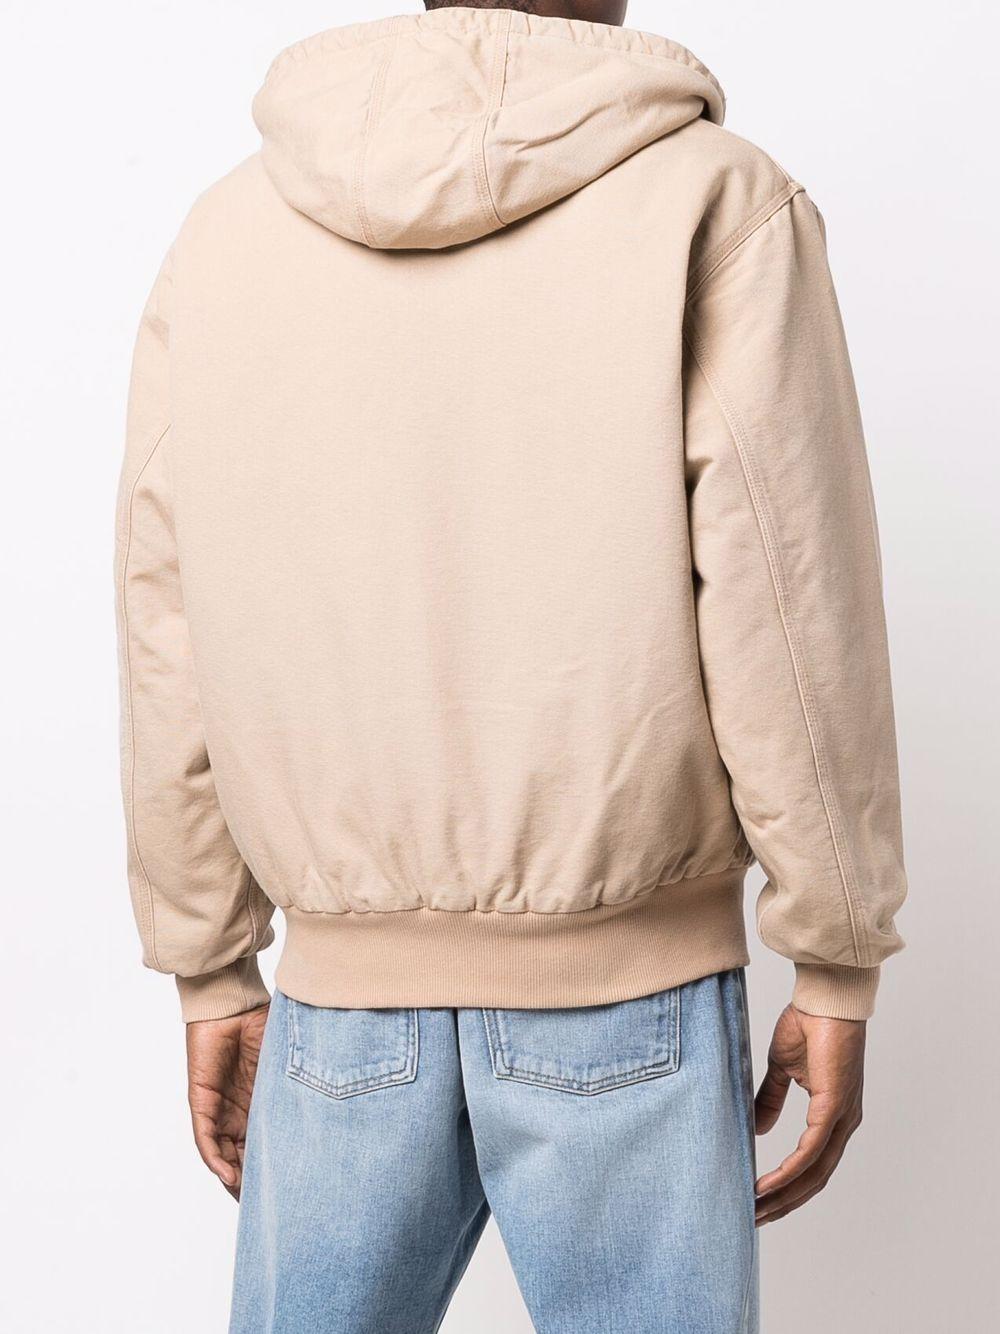 giacca og active uomo beige in cotone CARHARTT WIP | Giacche | I02736007E.3K